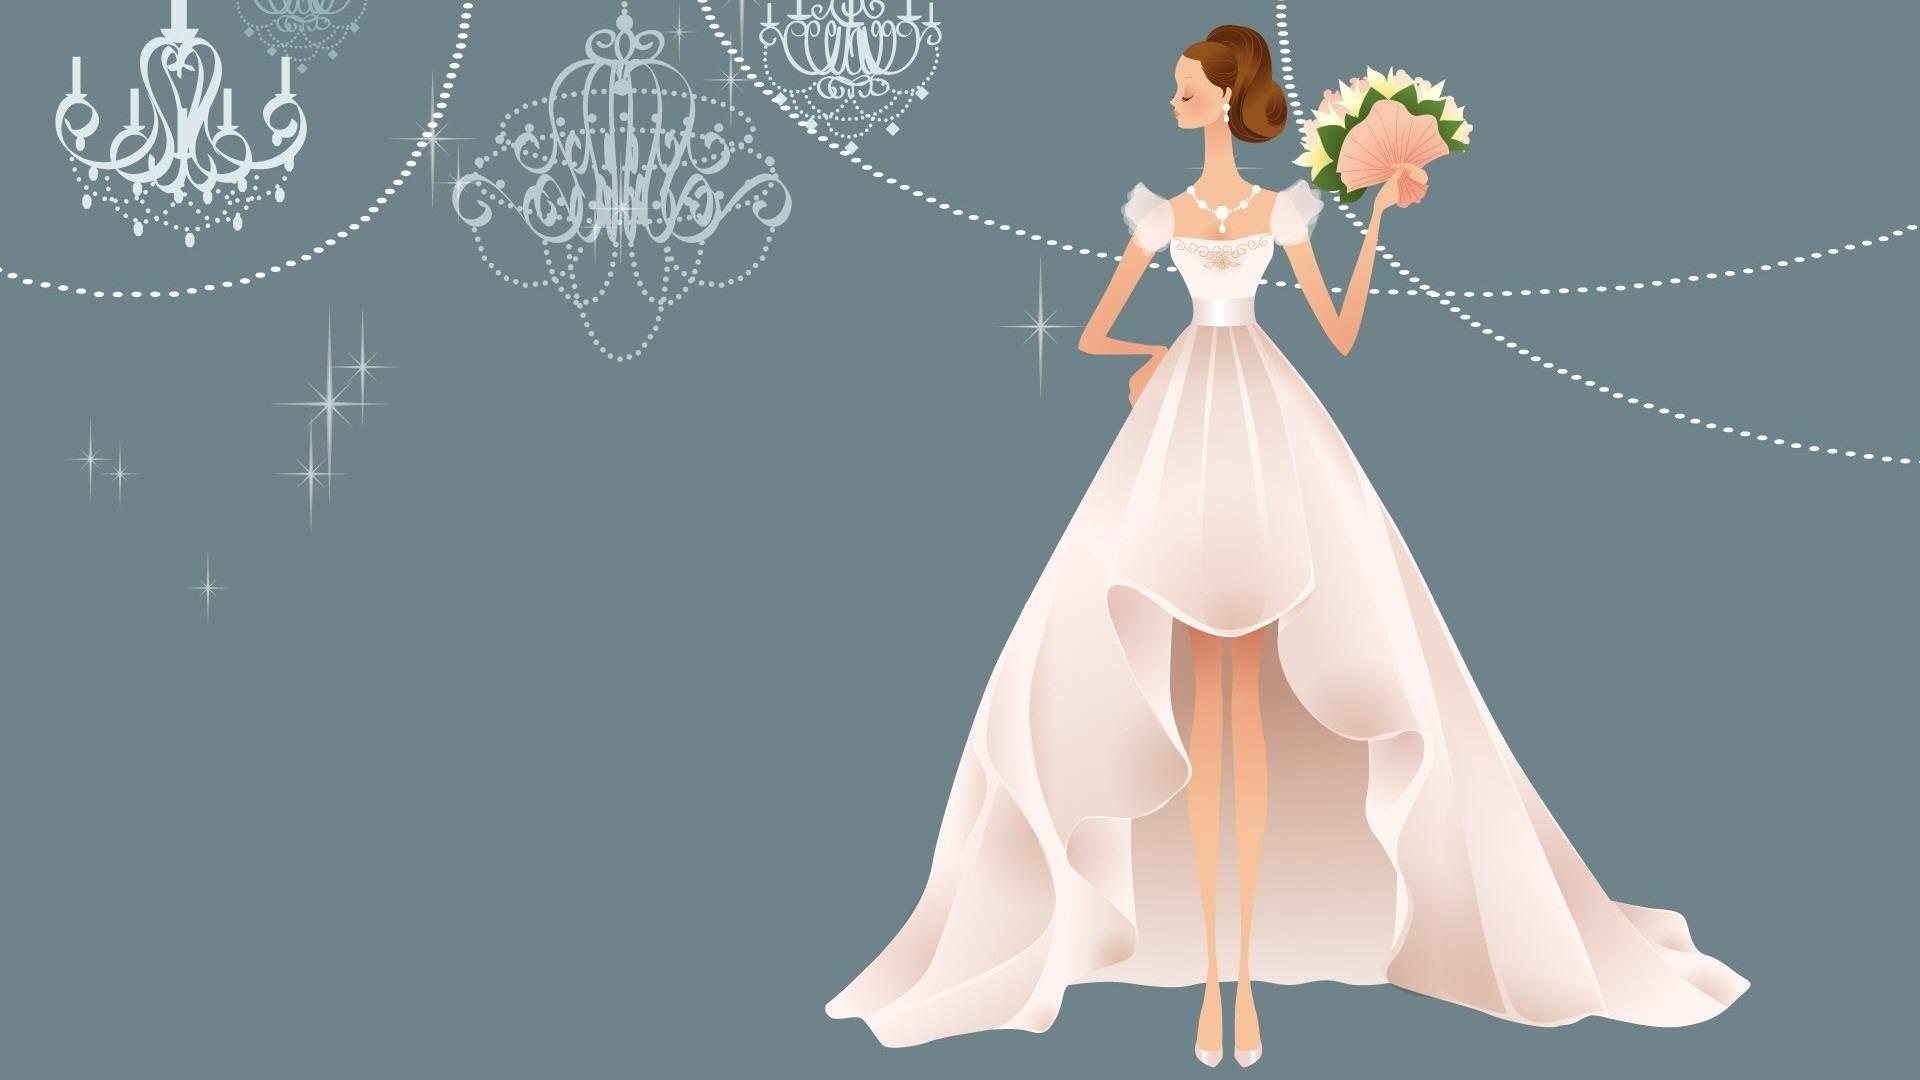 Wallpaper 20 Background Events Wedding